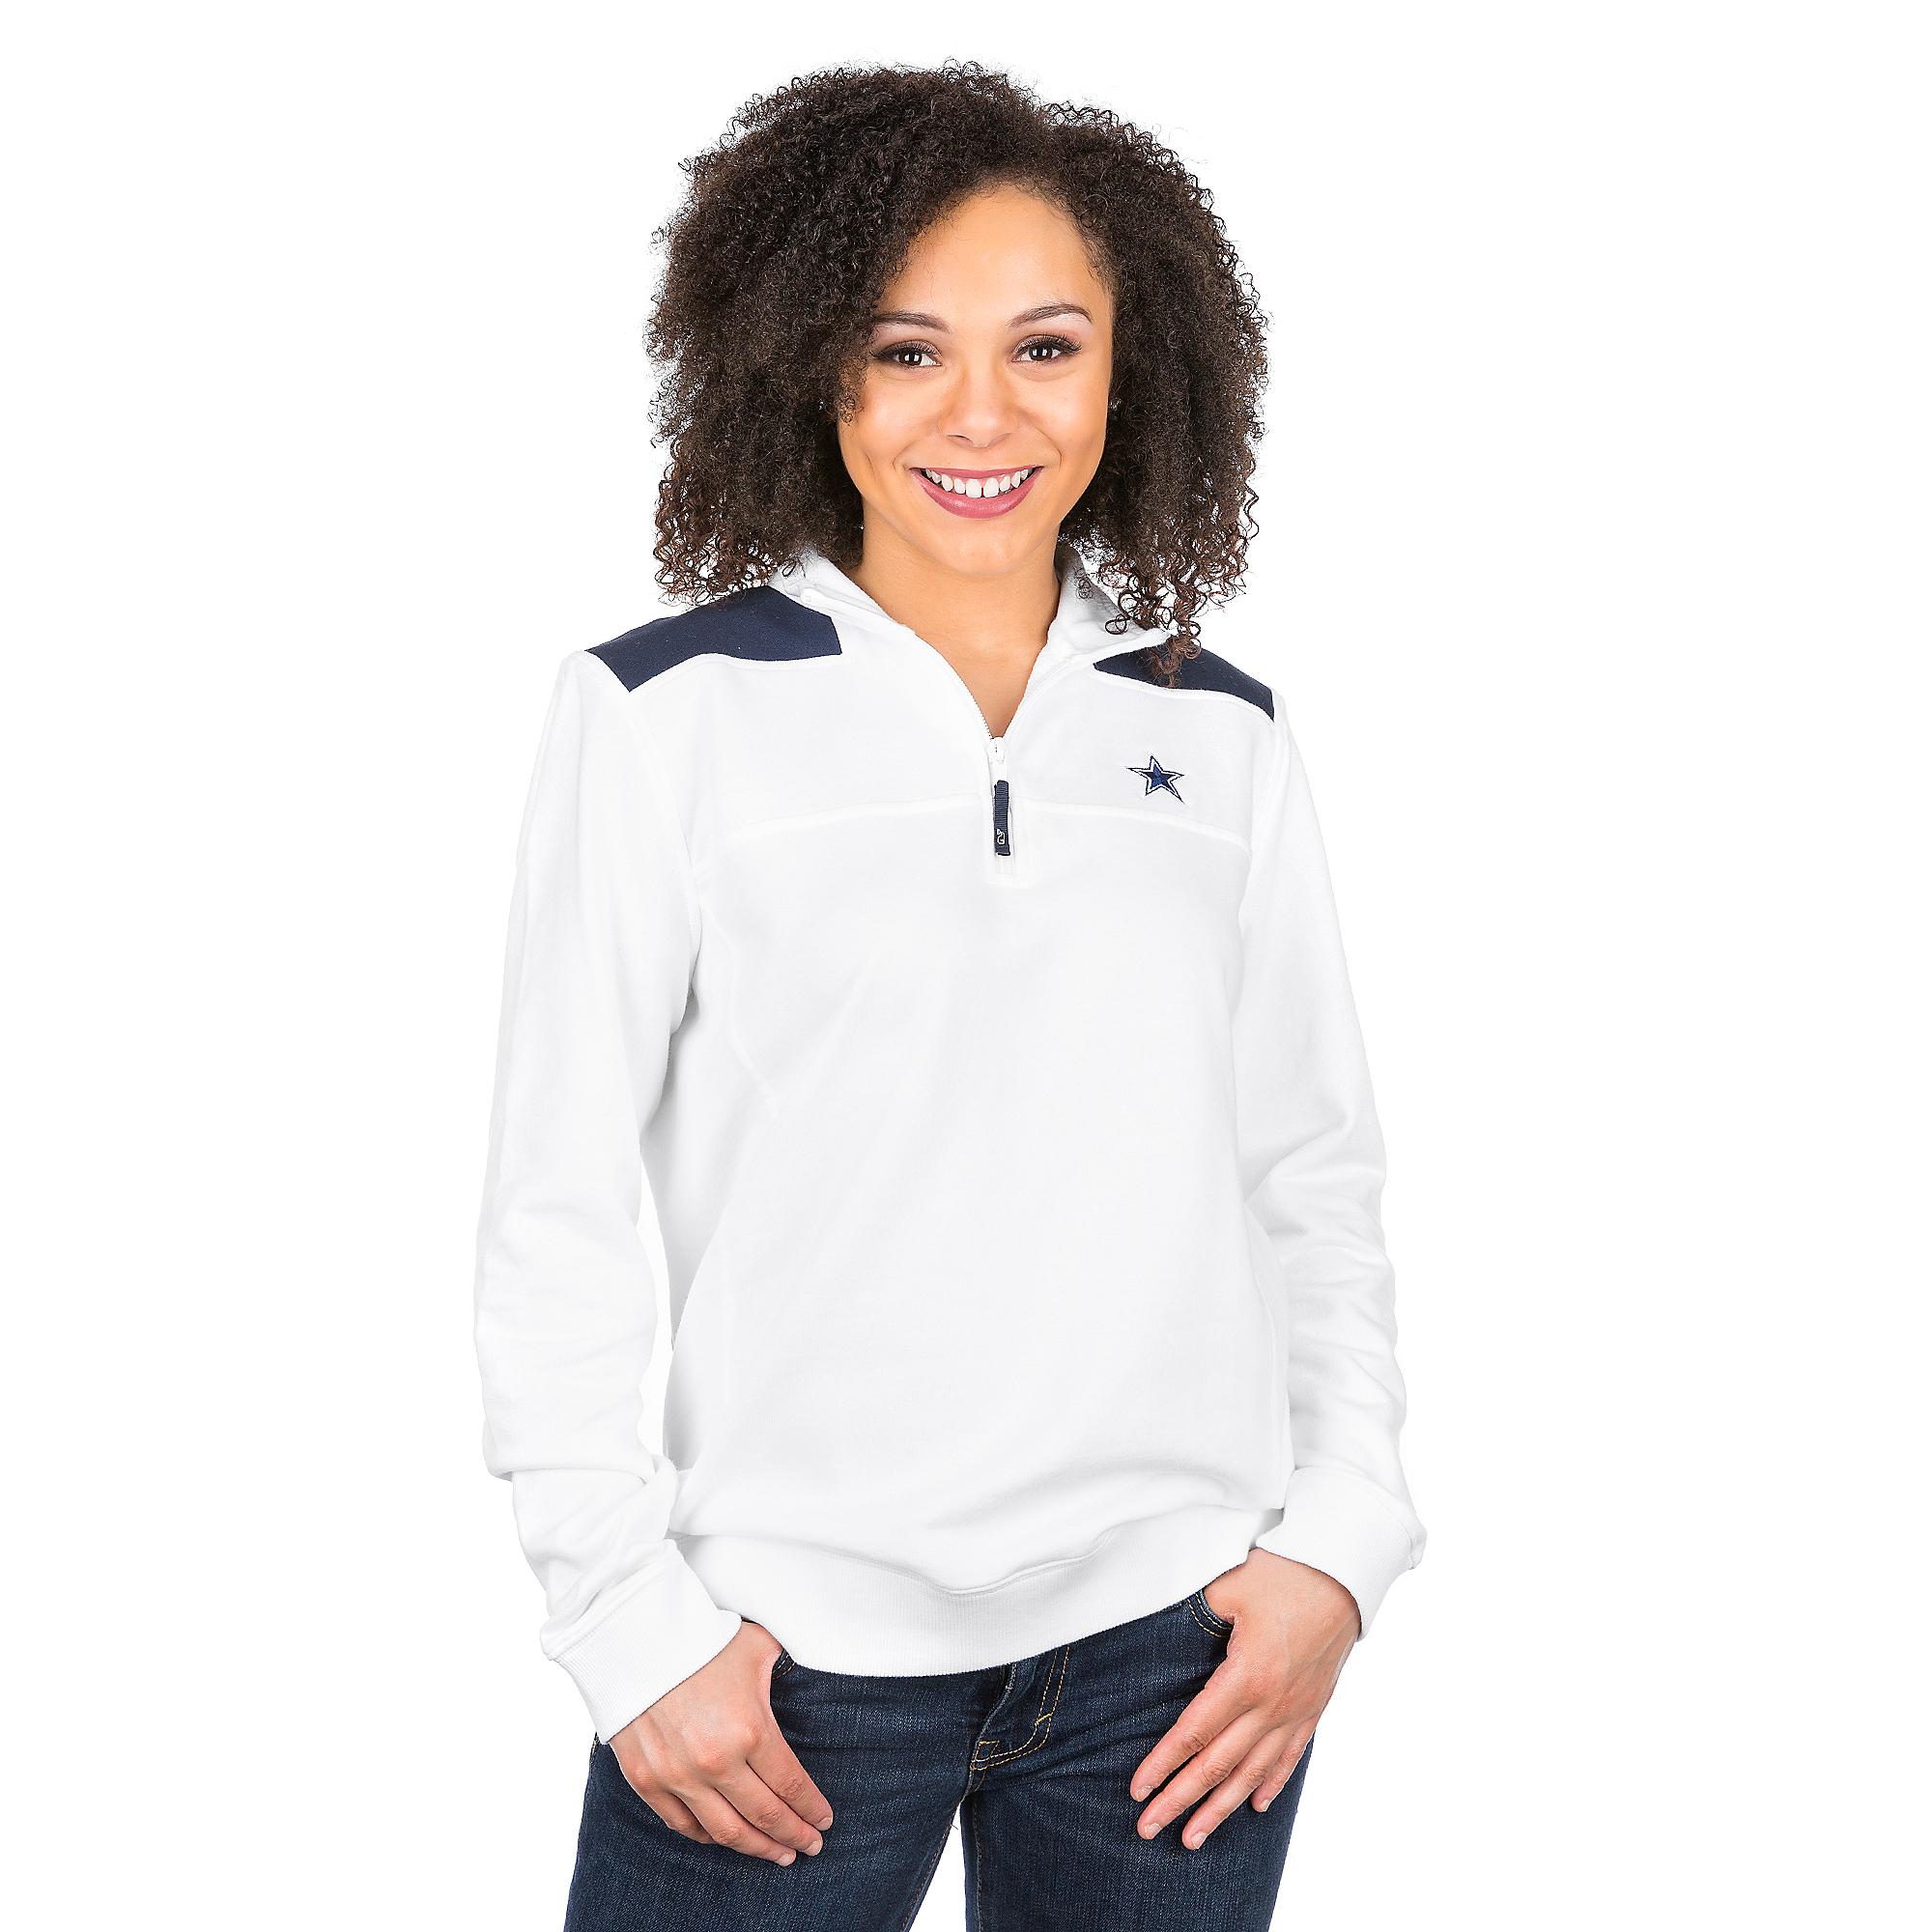 93dcf0603b6d72 Dallas Cowboys Vineyard Vines Womens Shep Shirt | Dallas Cowboys Pro ...